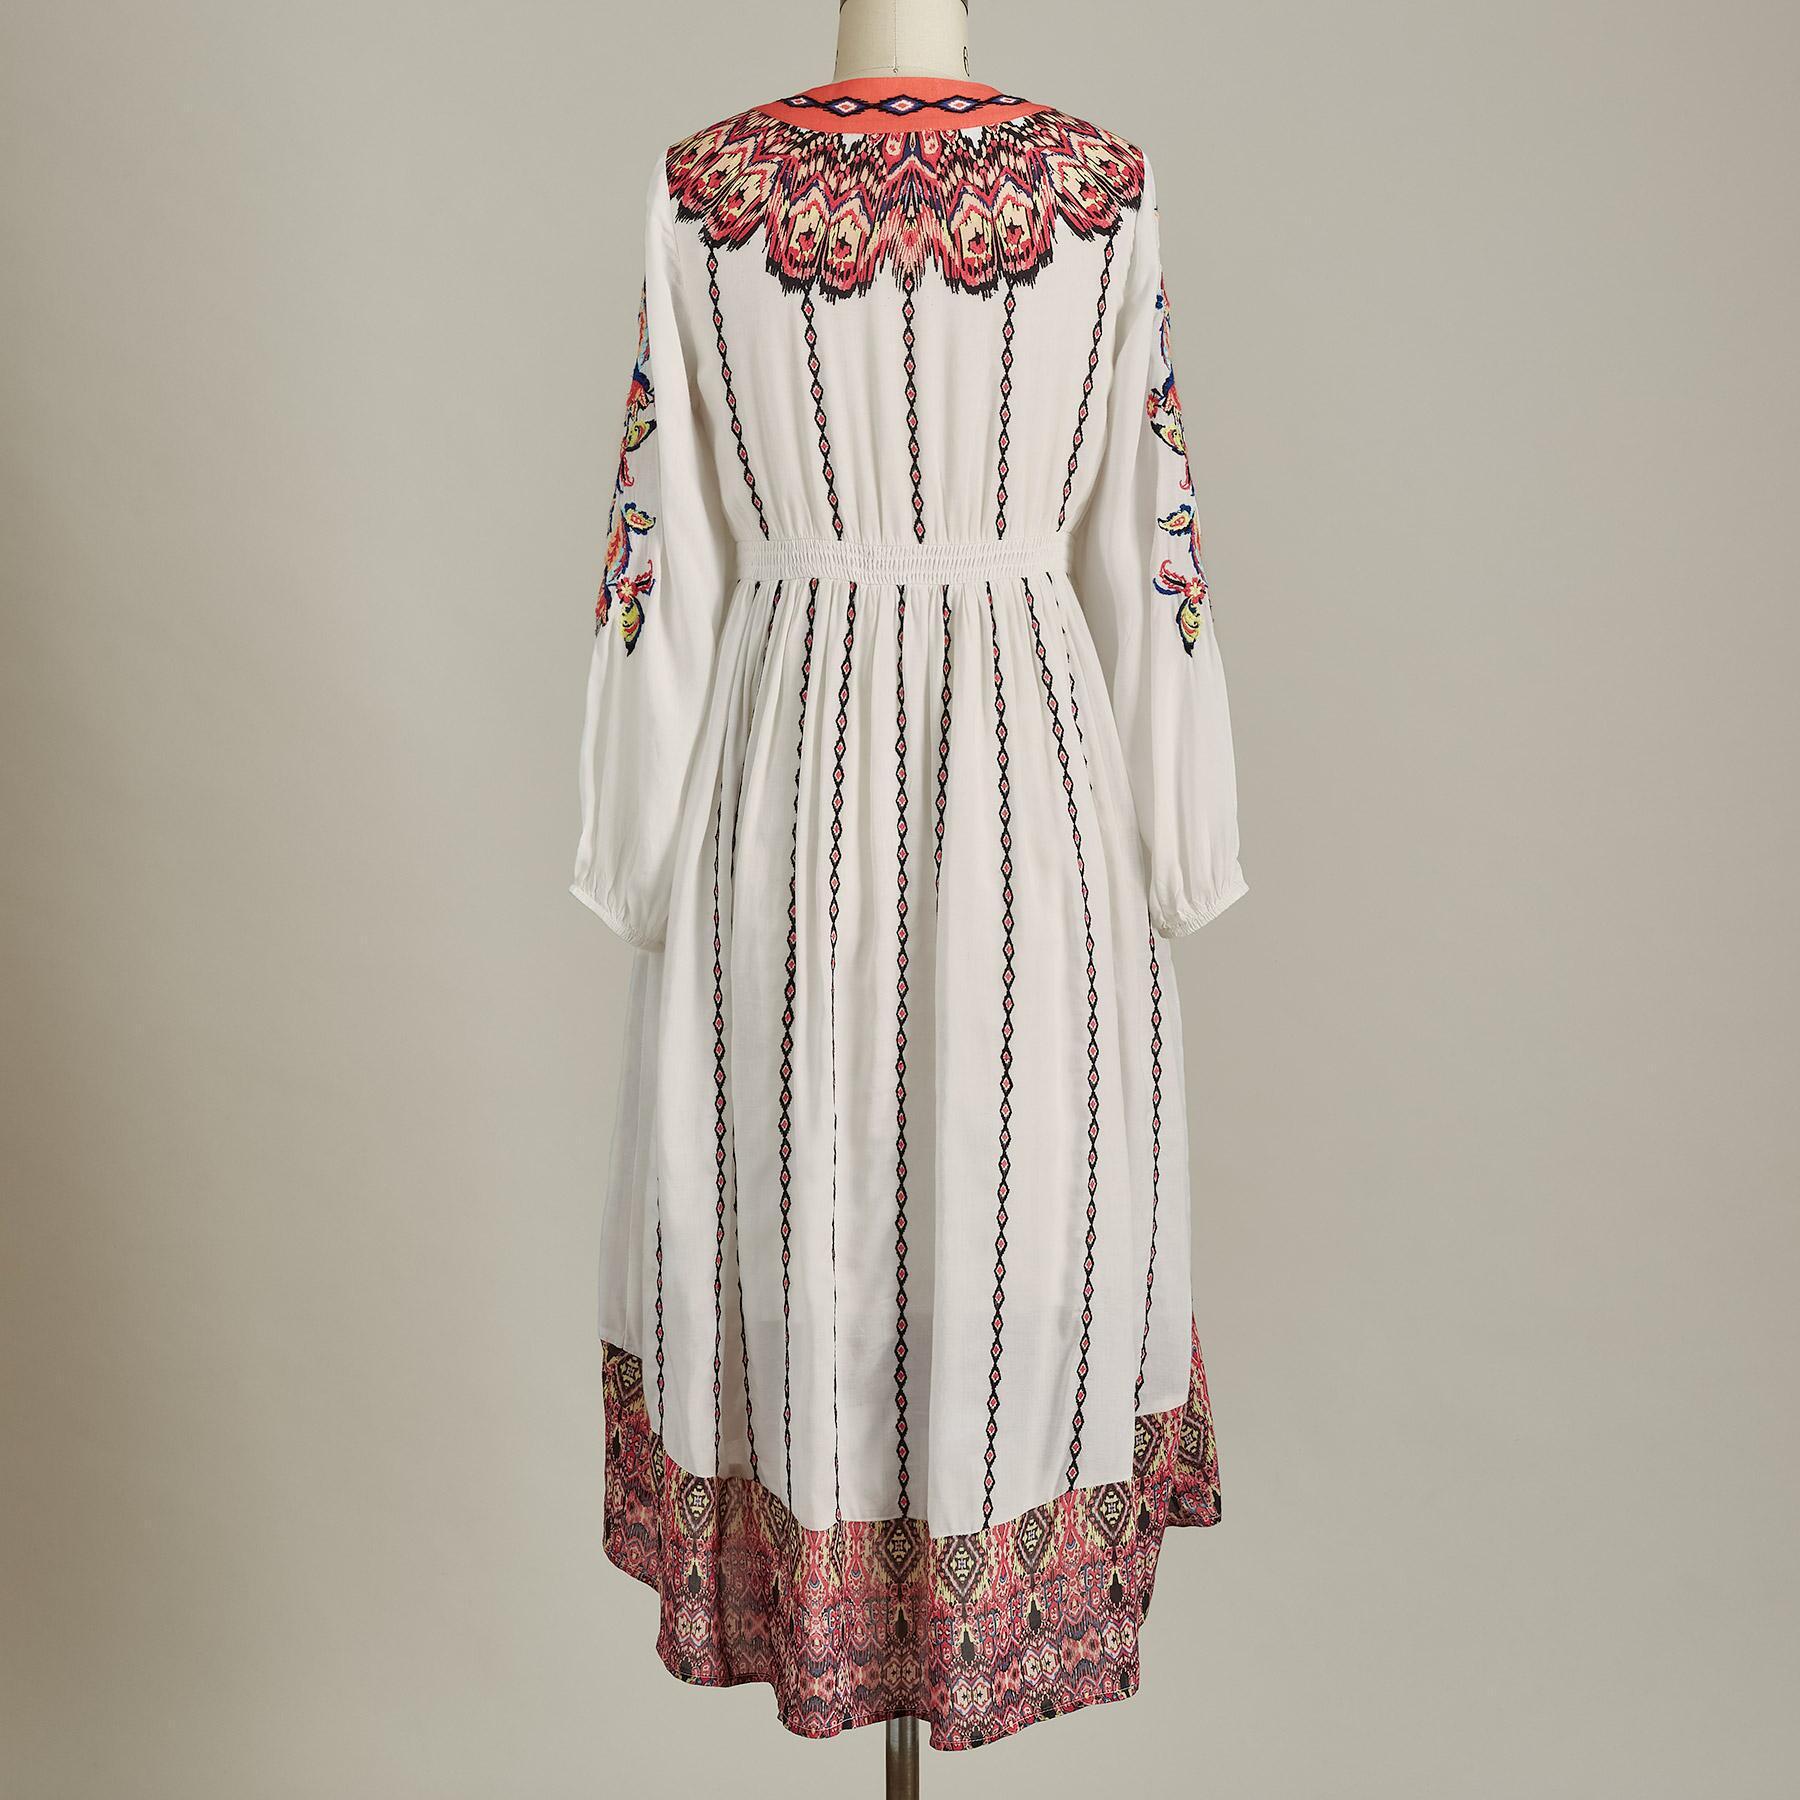 AMRITA STORY DRESS - PETITES: View 2